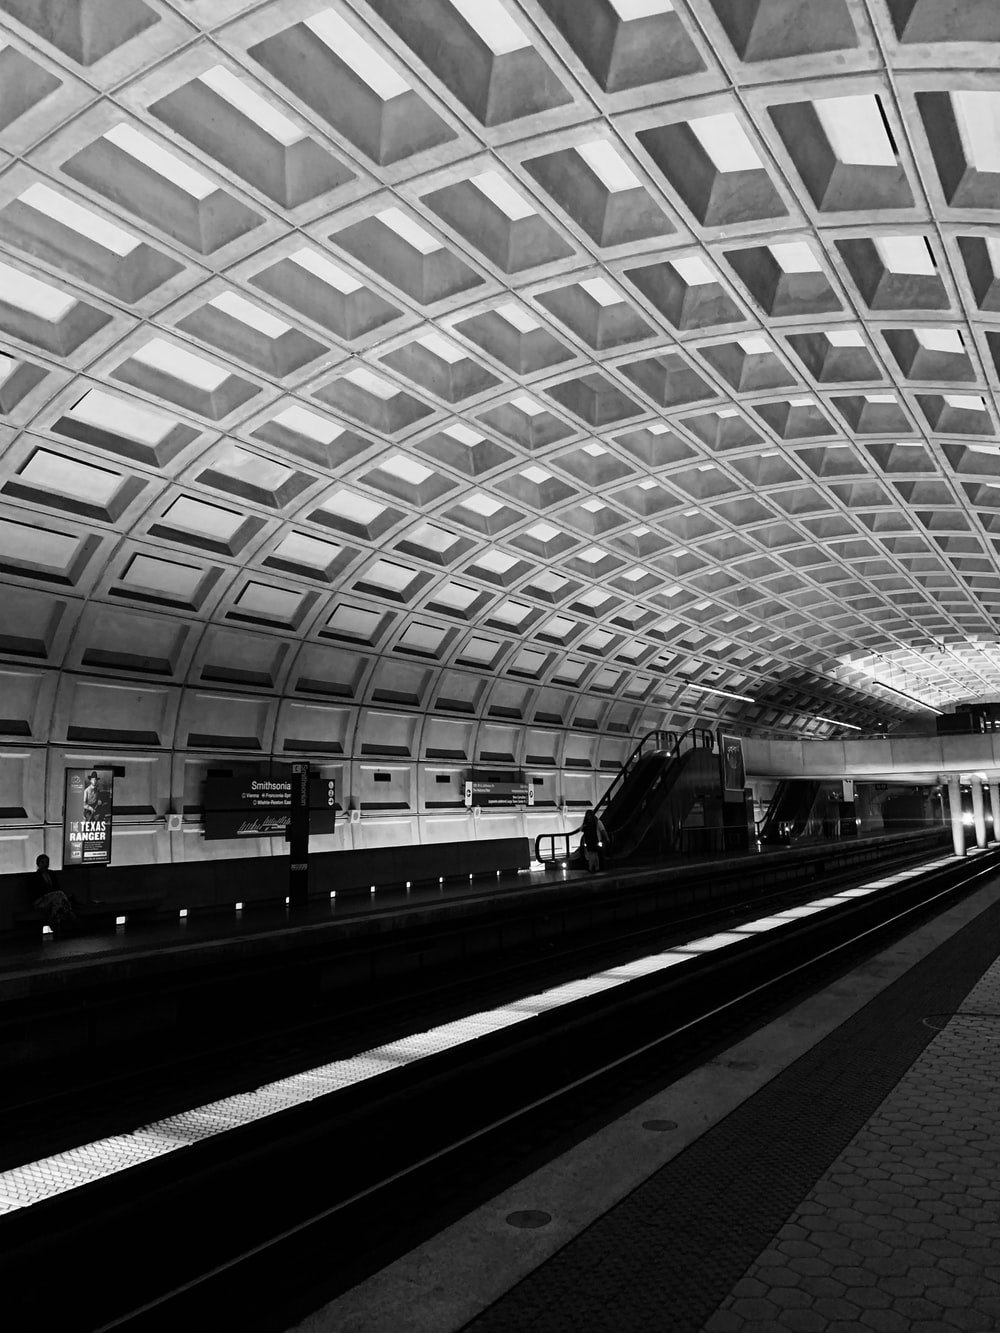 empty subway train station greyscale photography